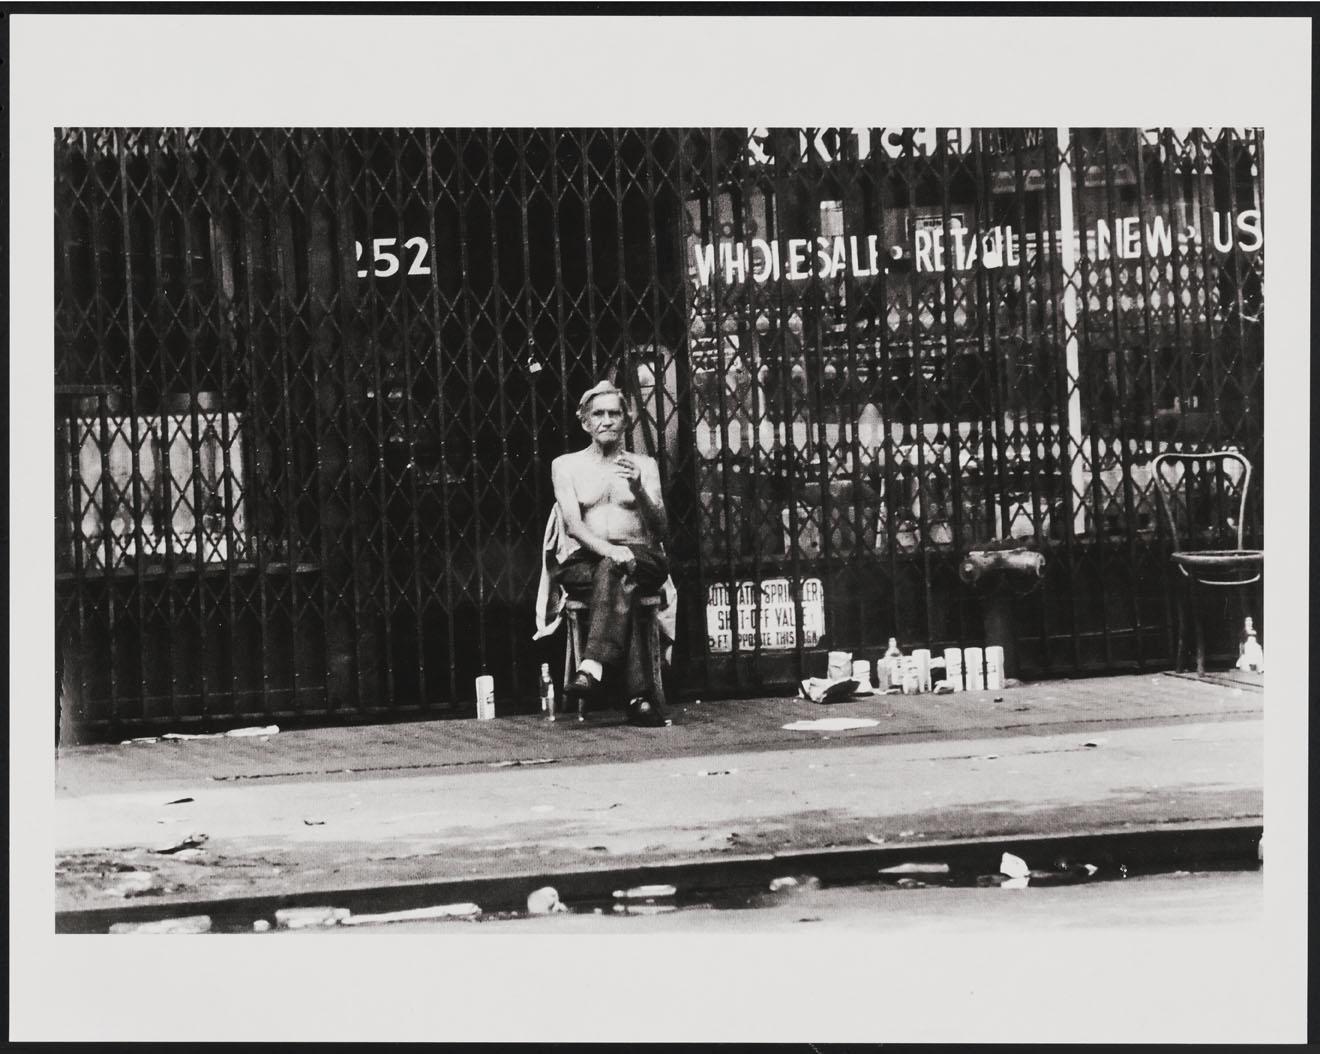 Leland Bobbé, The Bowery, 1974